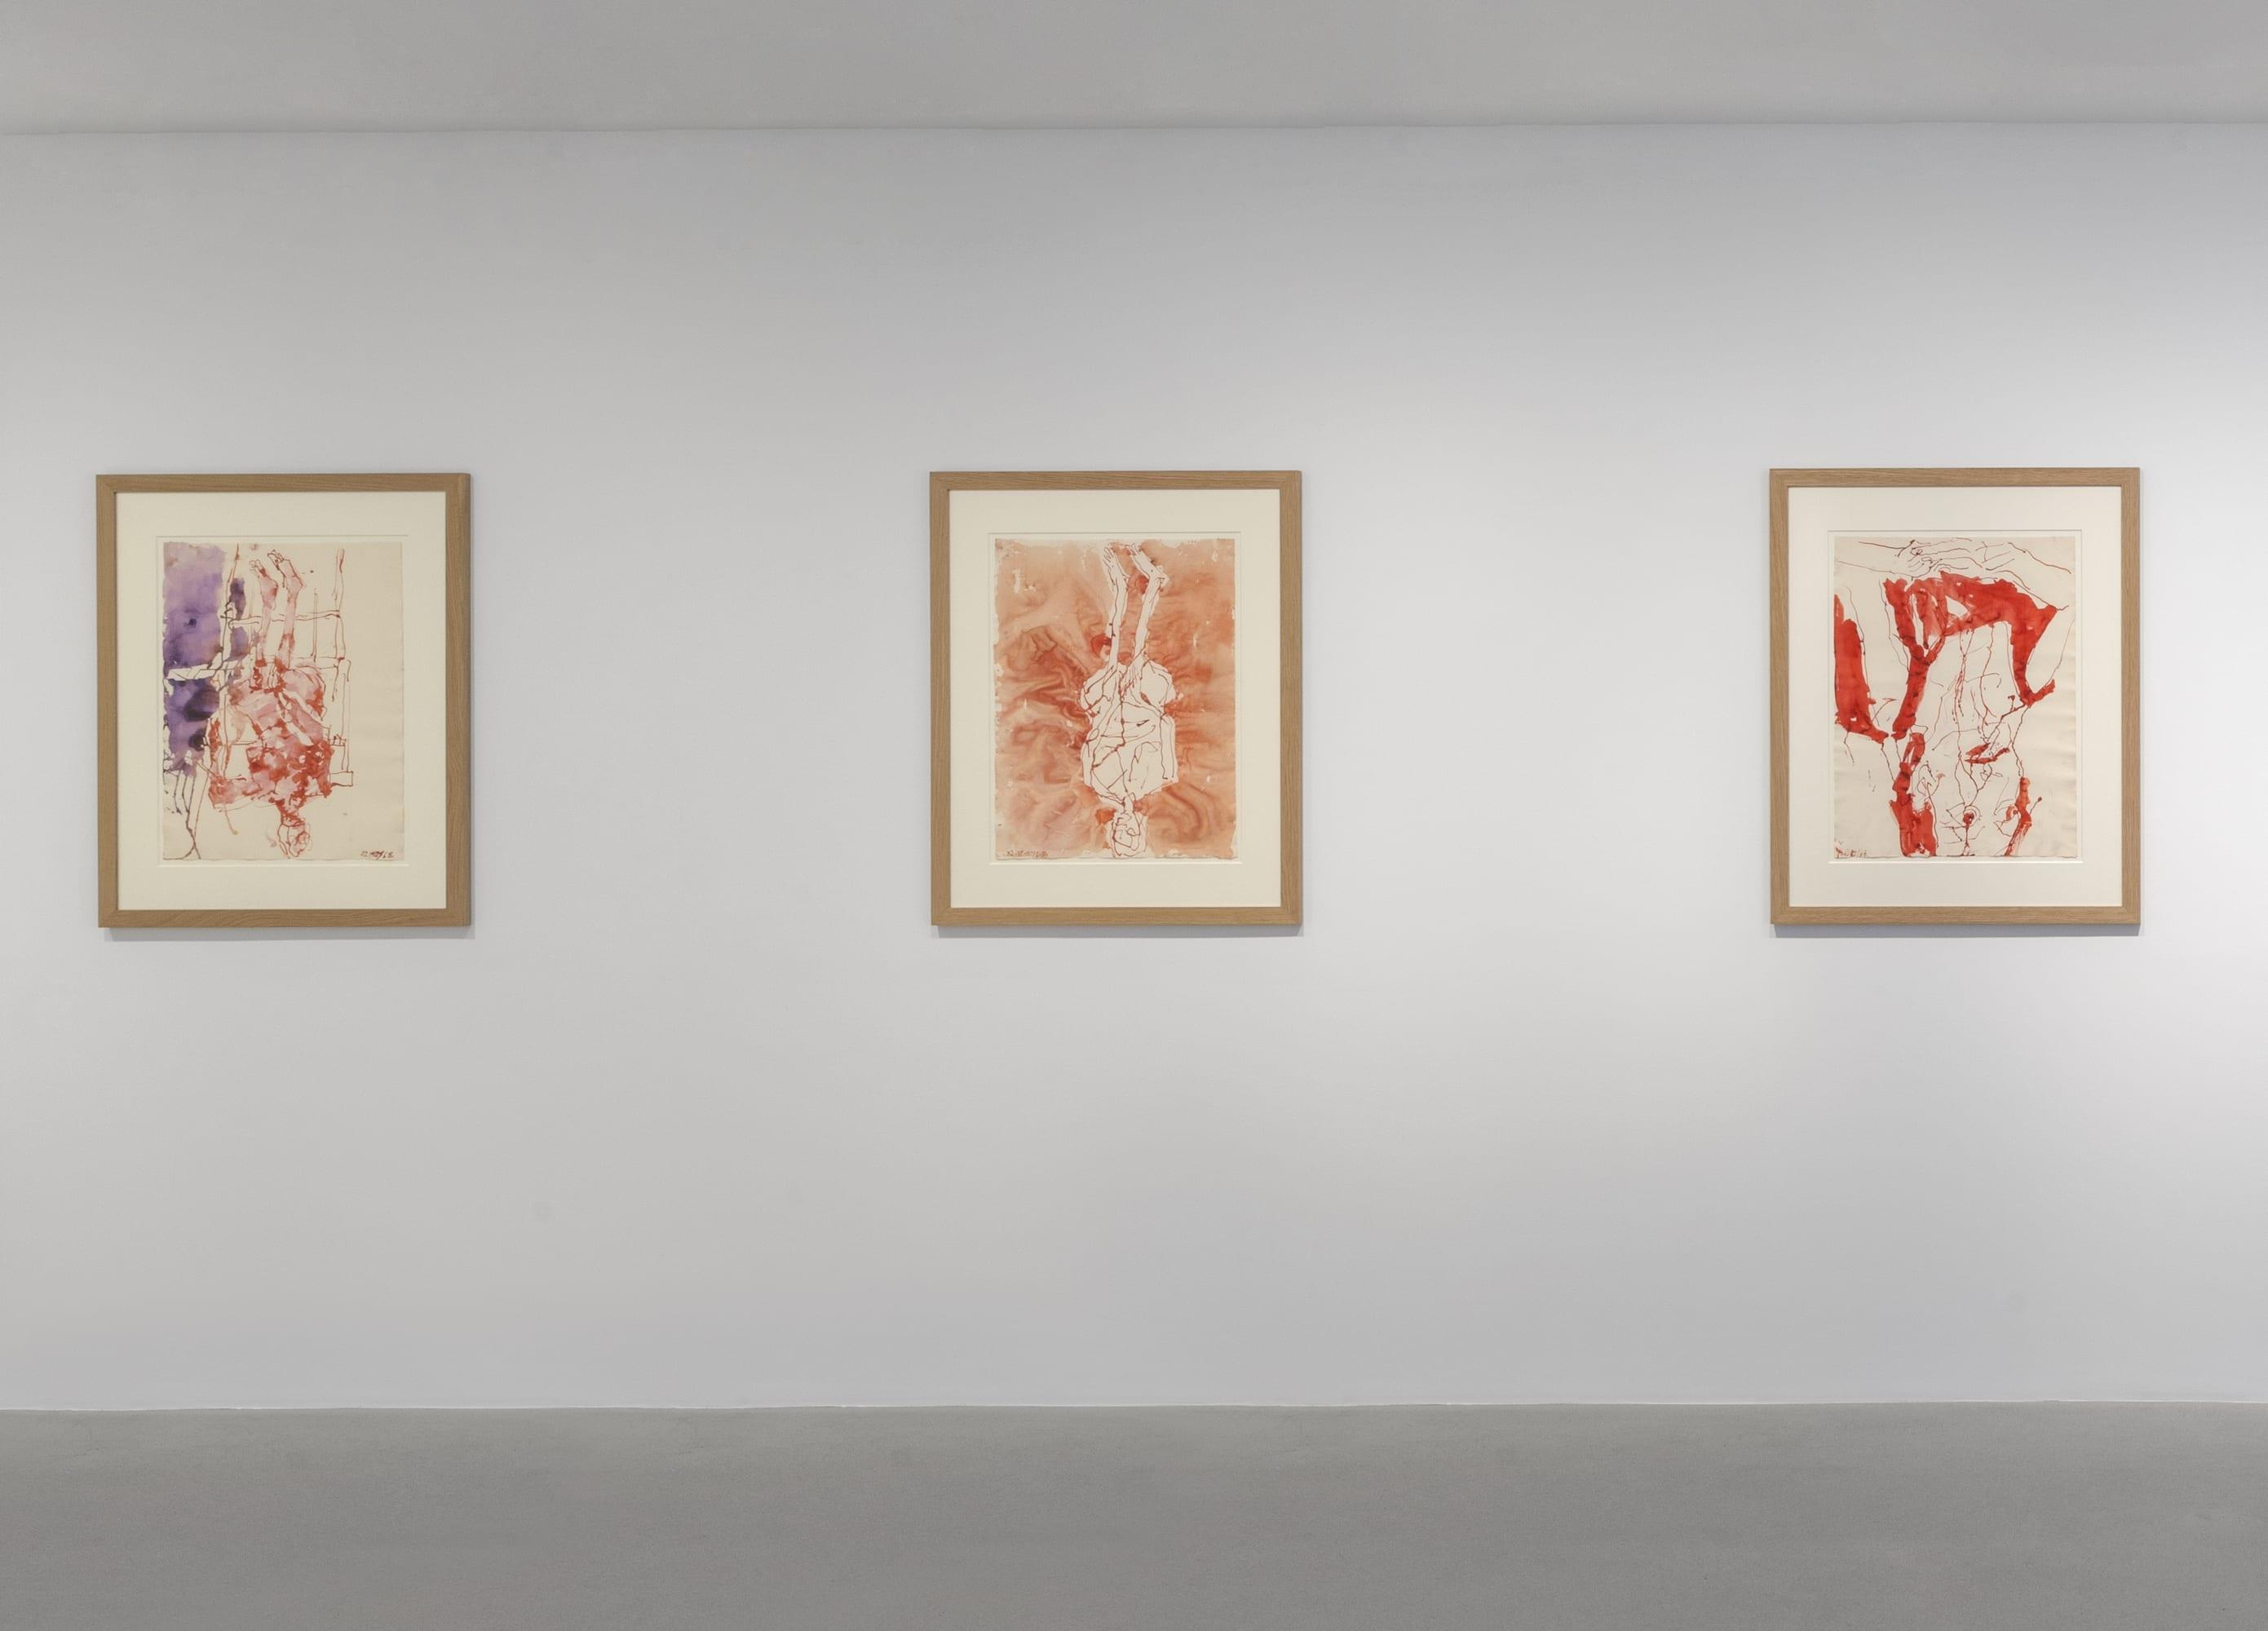 Georg Baselitz New Drawings